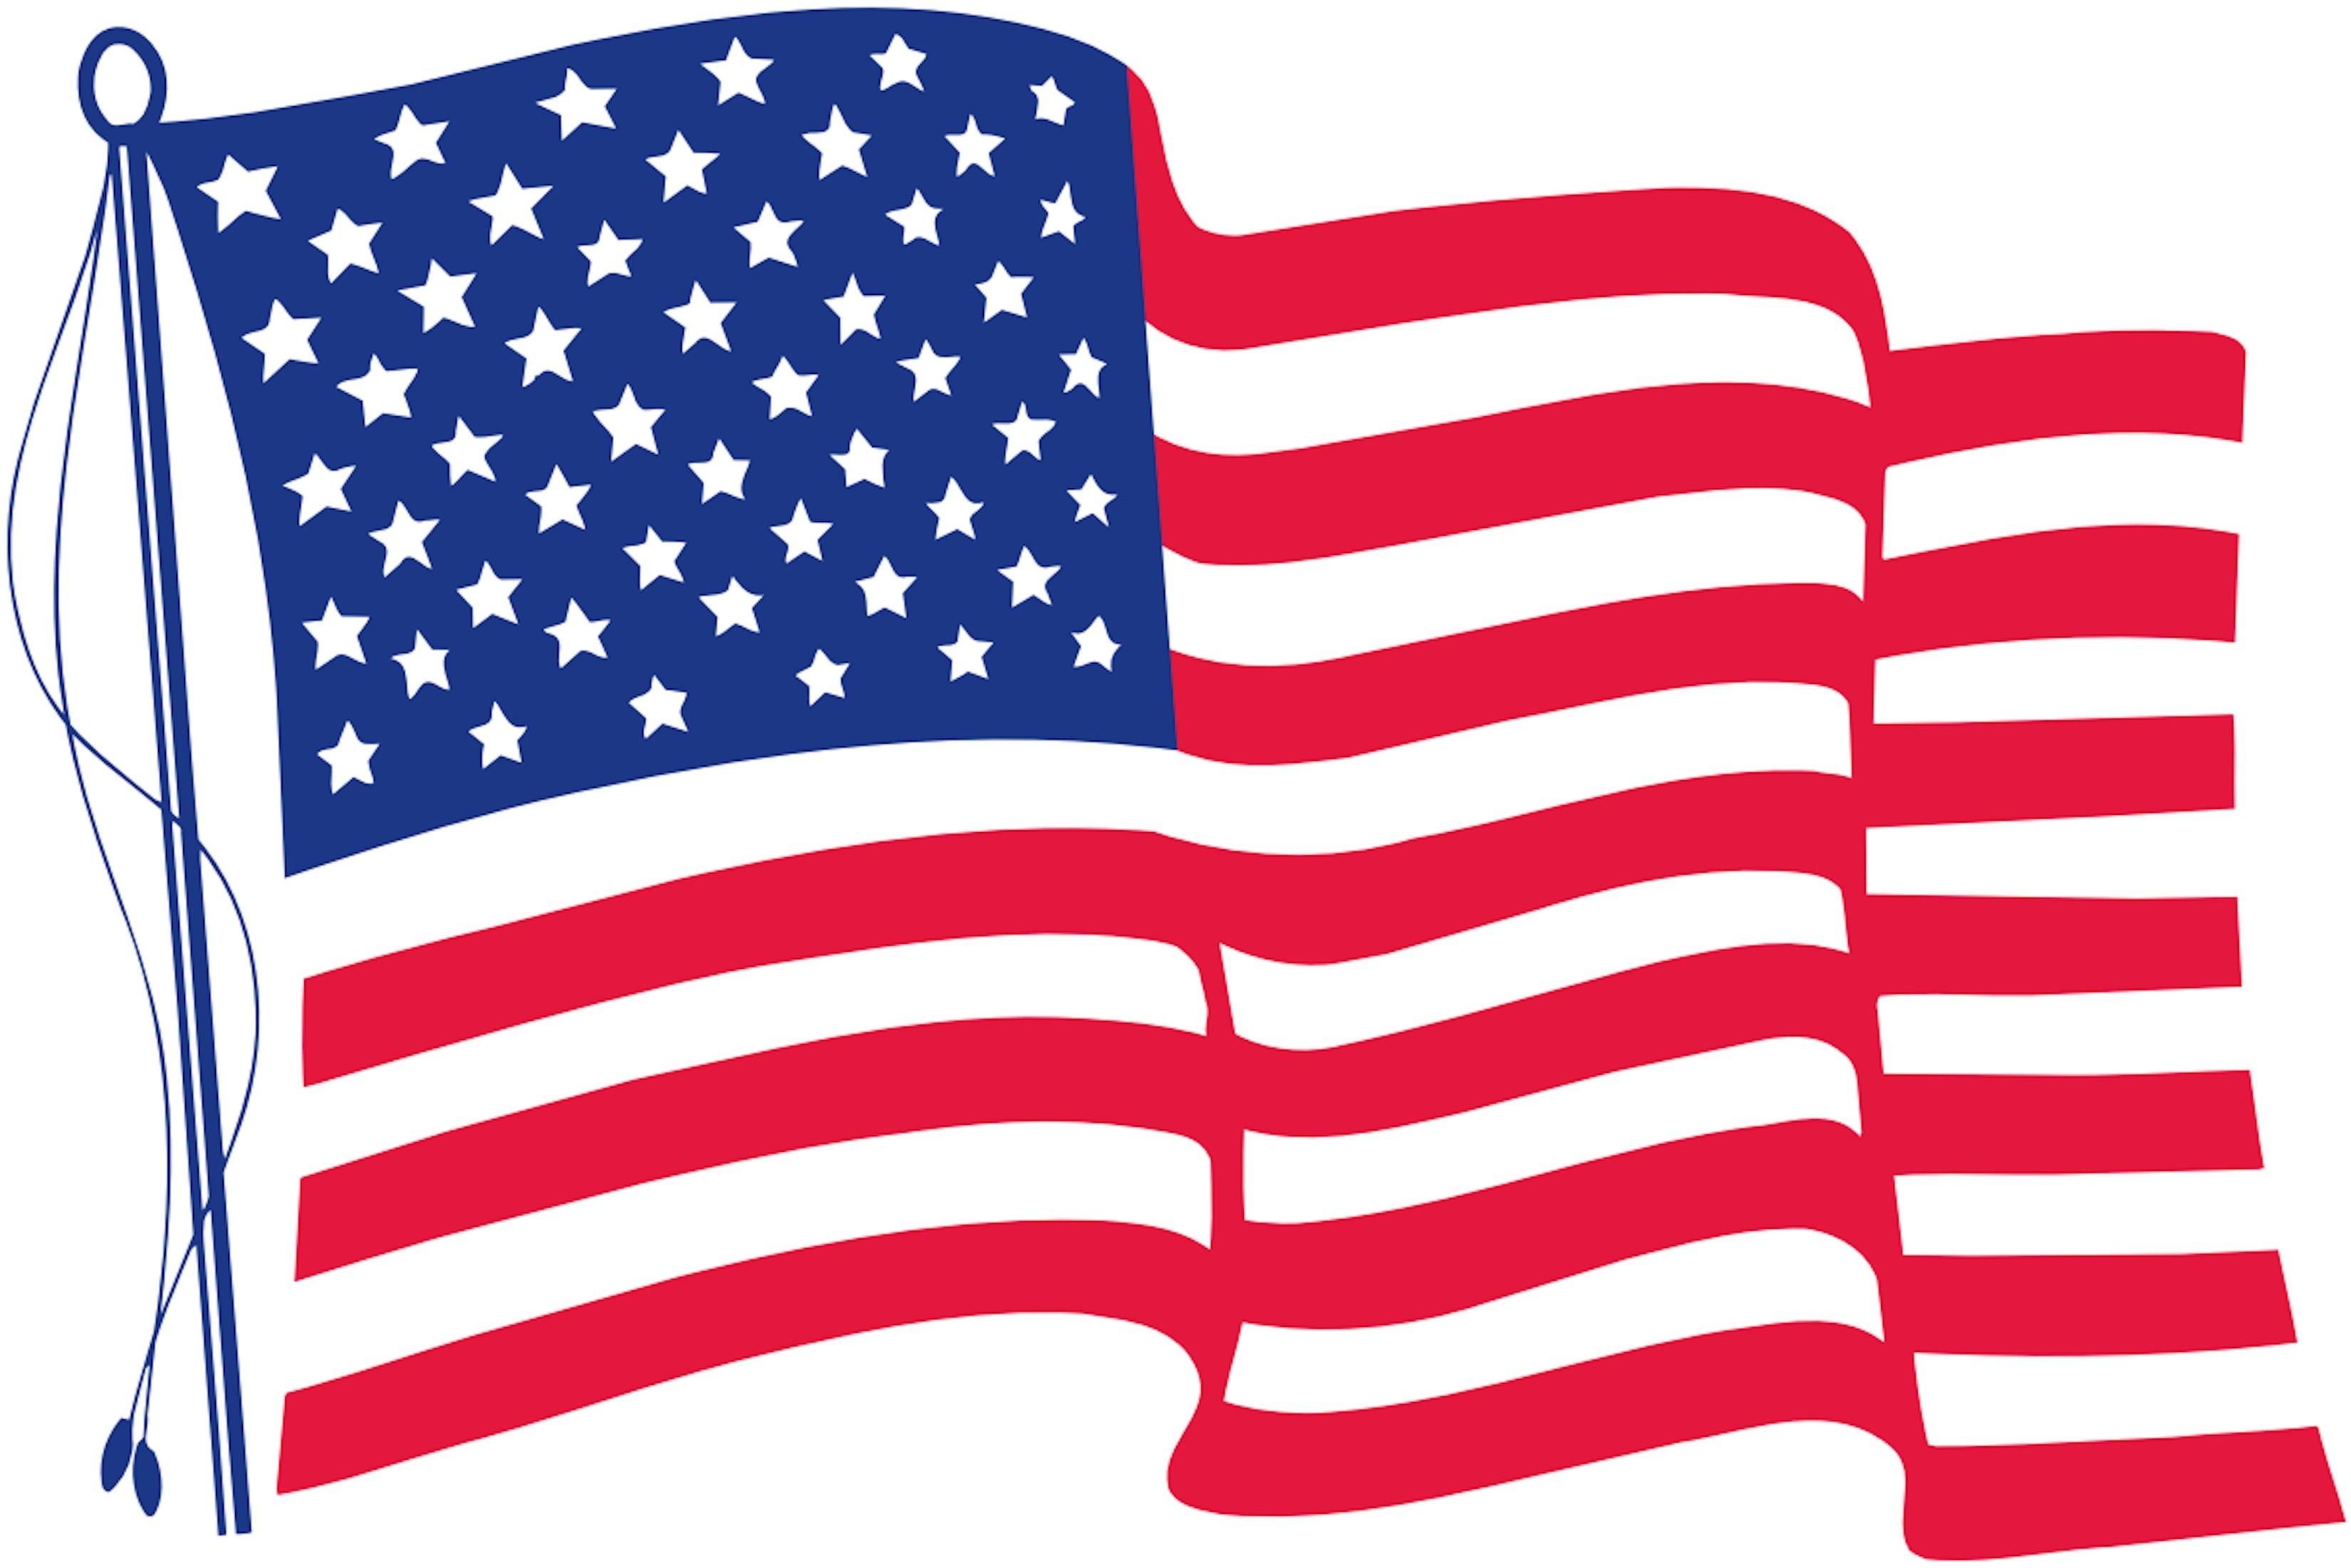 Printable american flag clipart jpg royalty free stock American Flag Printable - Making-The-Web.com jpg royalty free stock